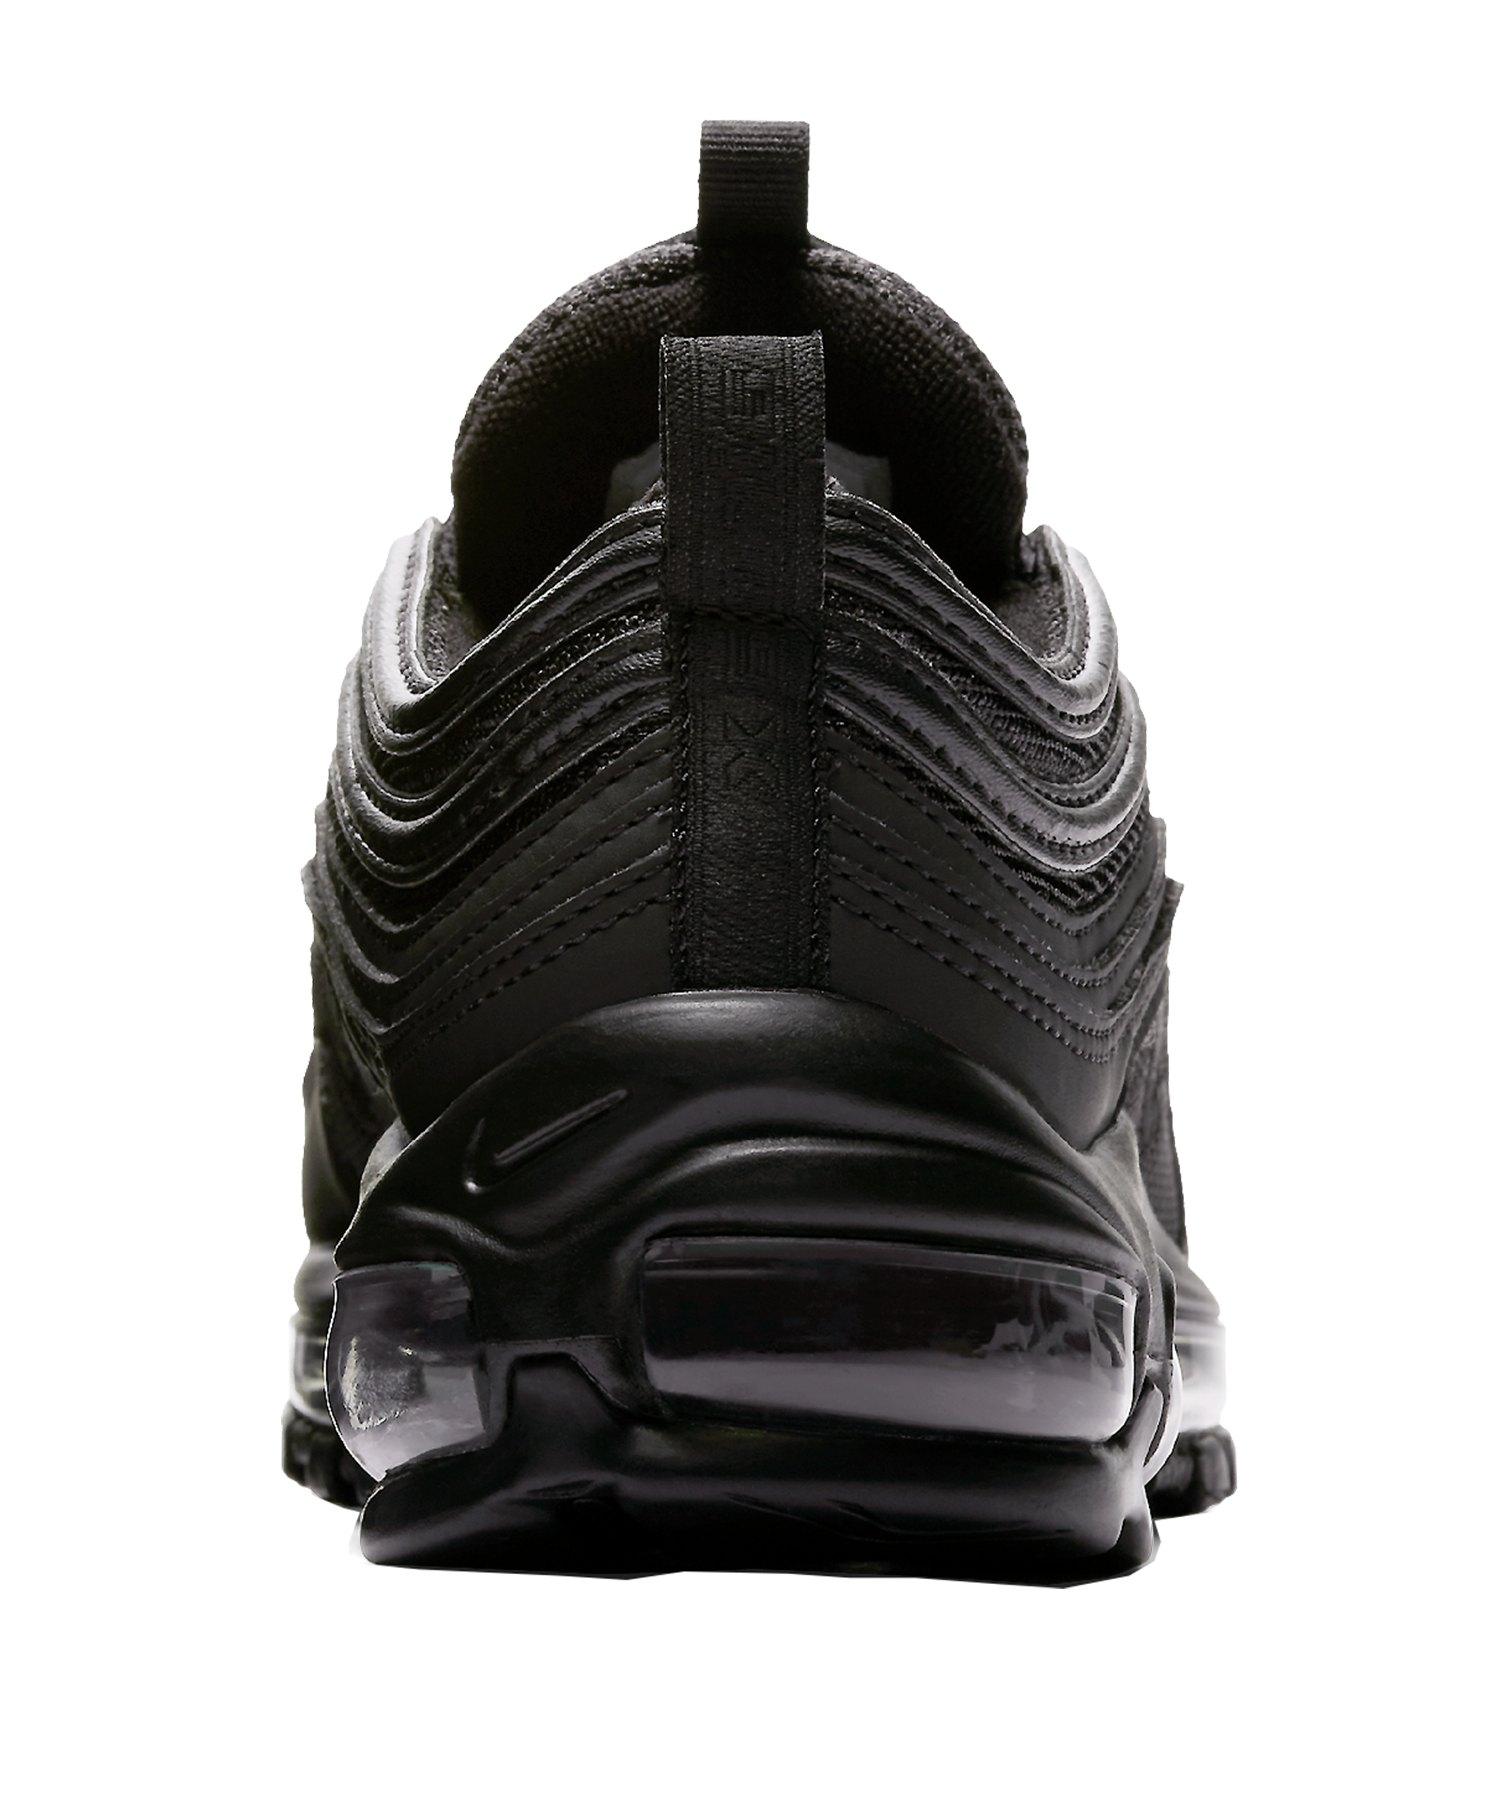 Sneaker Schwarz Nike 97 F001 Kids Air Max GjVLqSUzMp